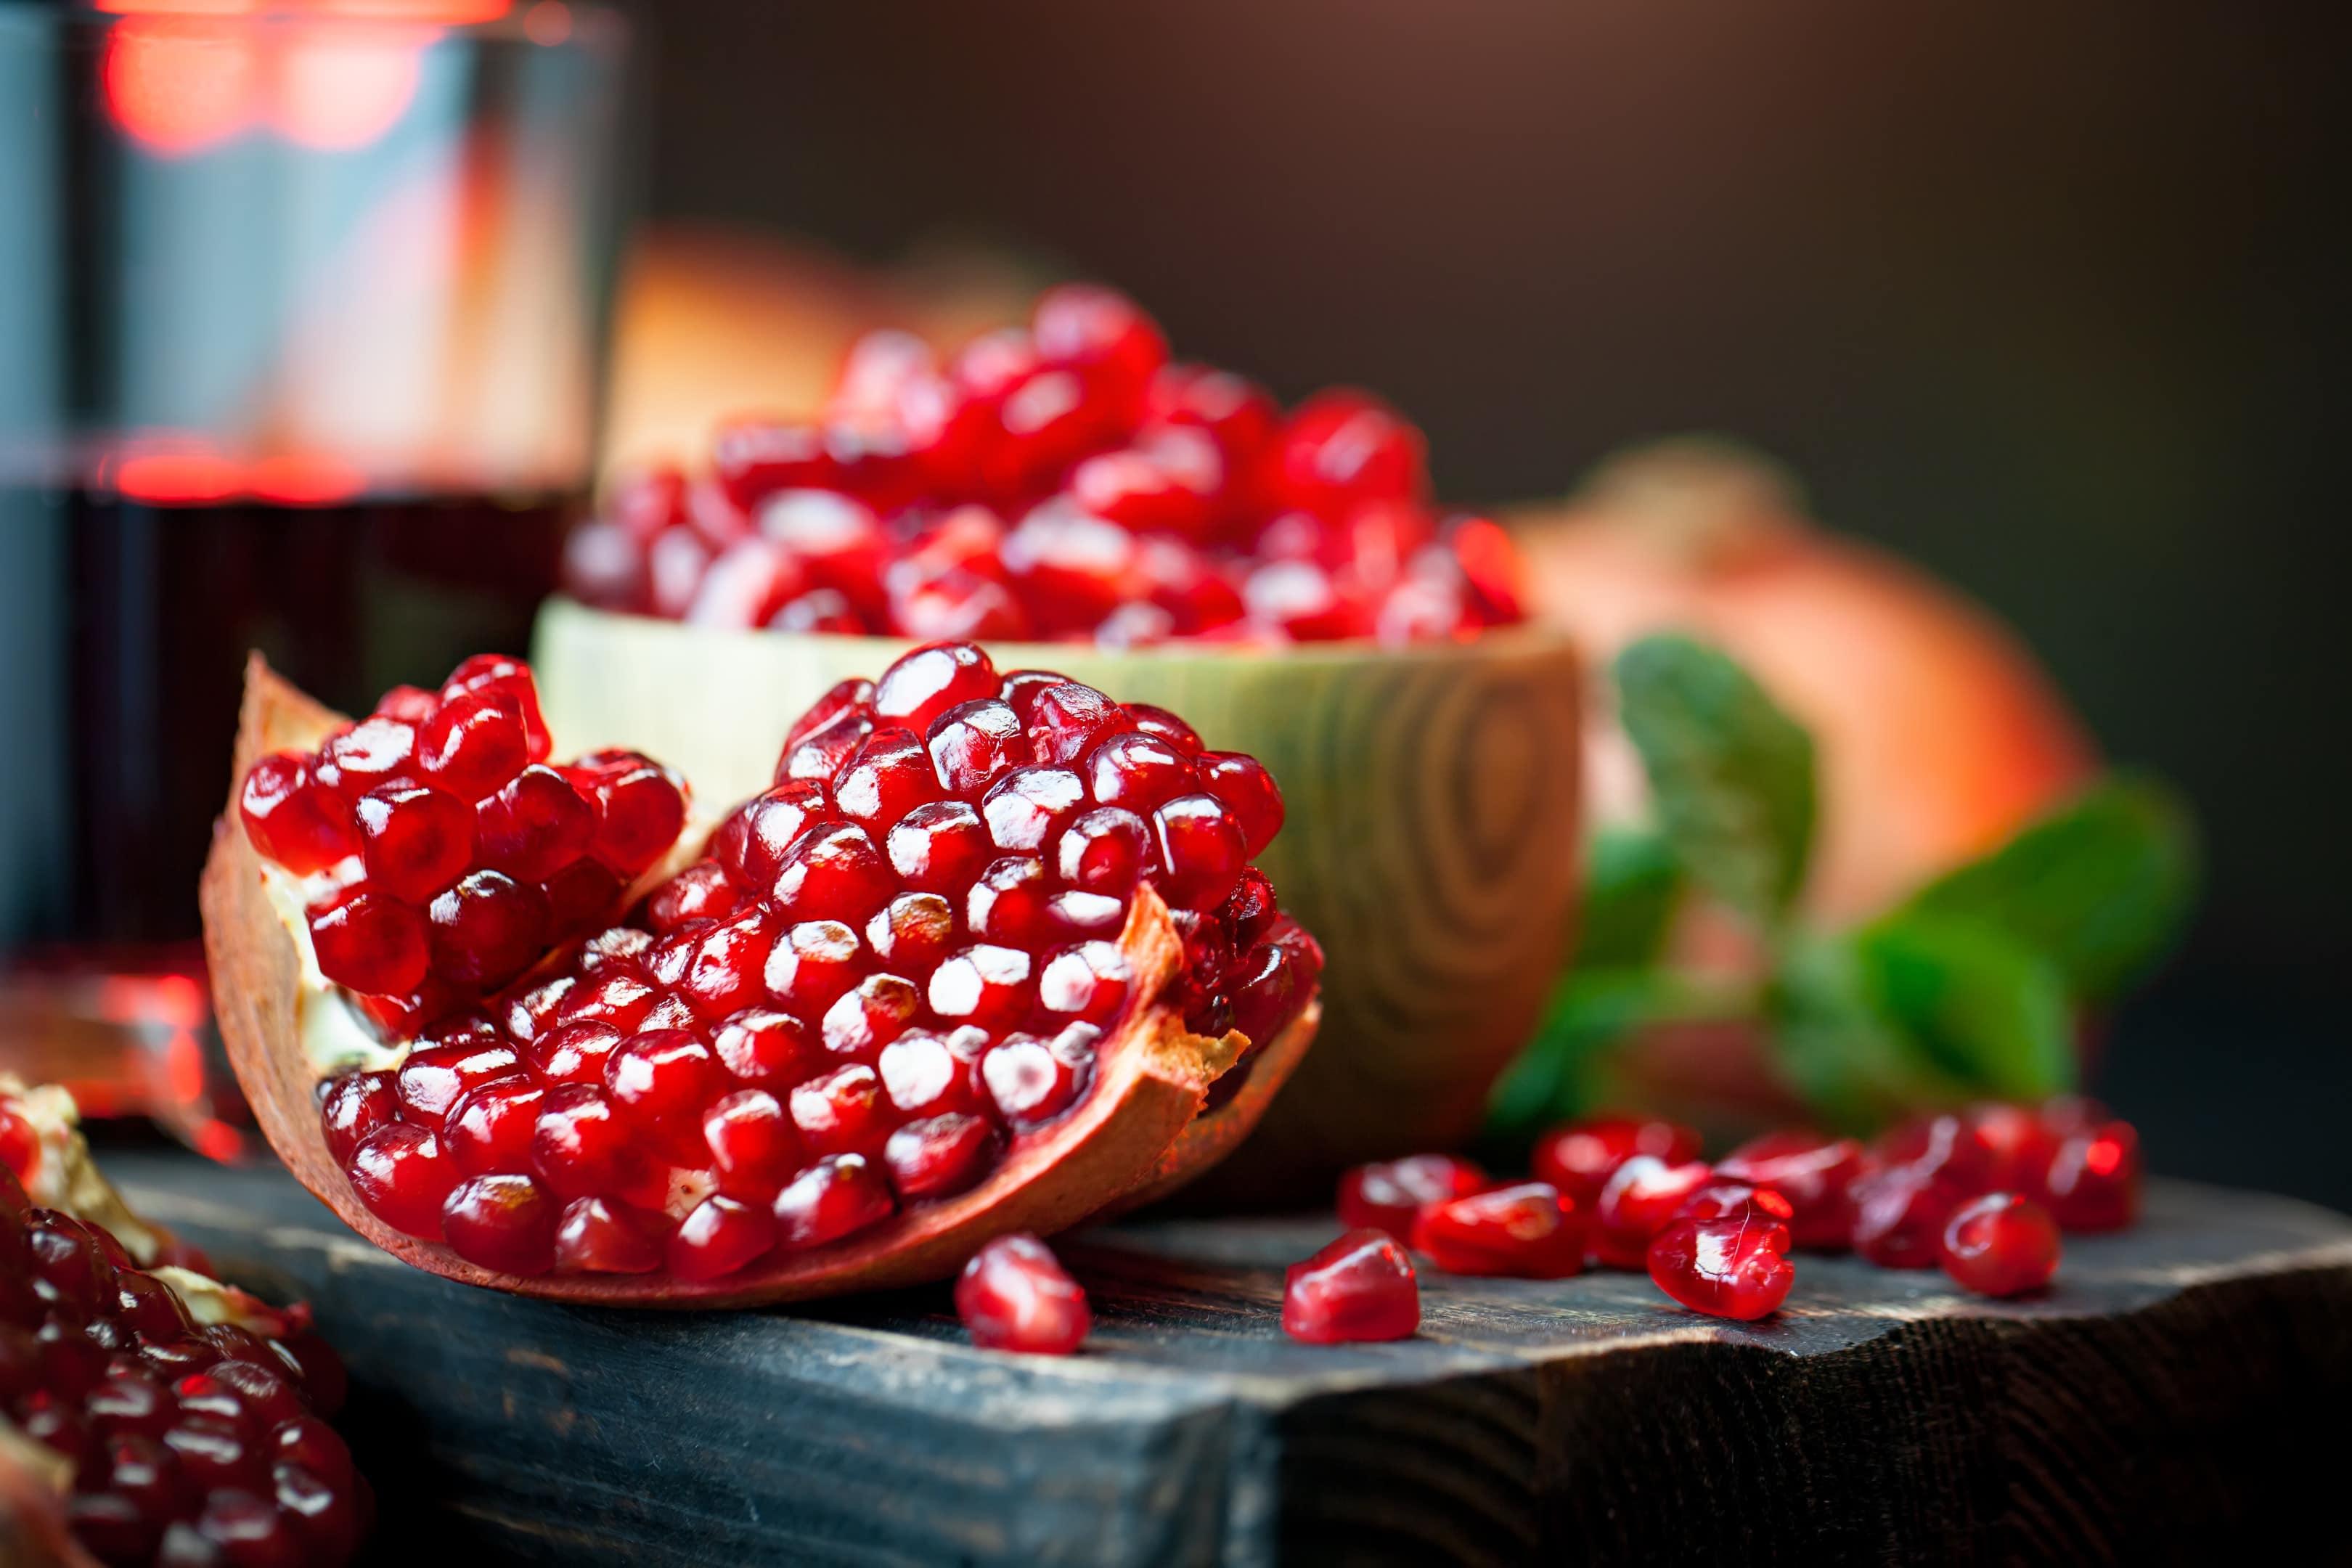 Opened Ripe Pomegranate